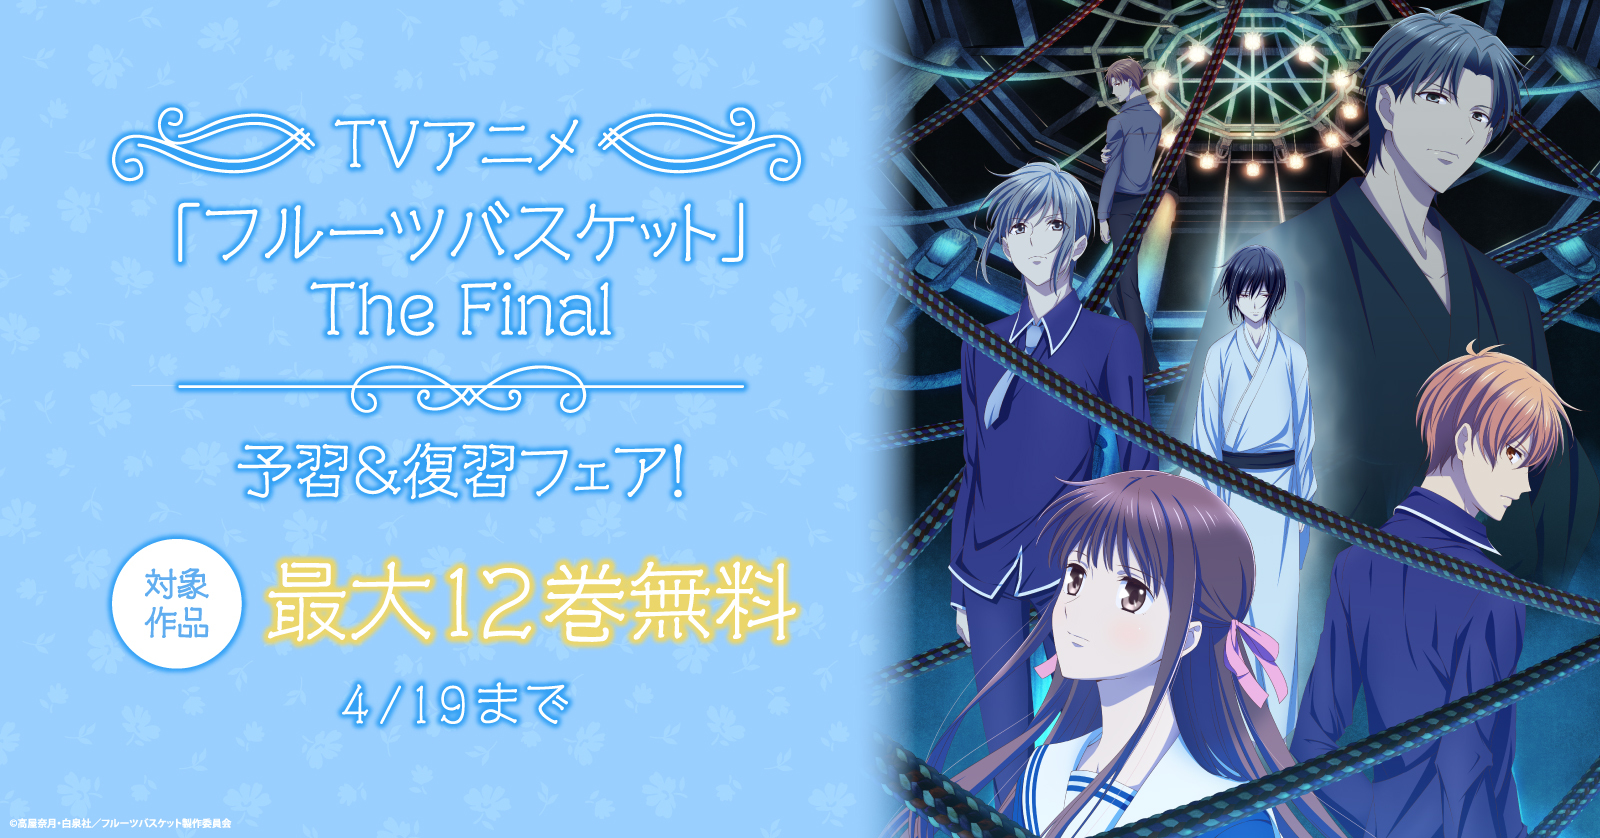 TVアニメ「フルーツバスケット」The Final 予習&復習フェア!